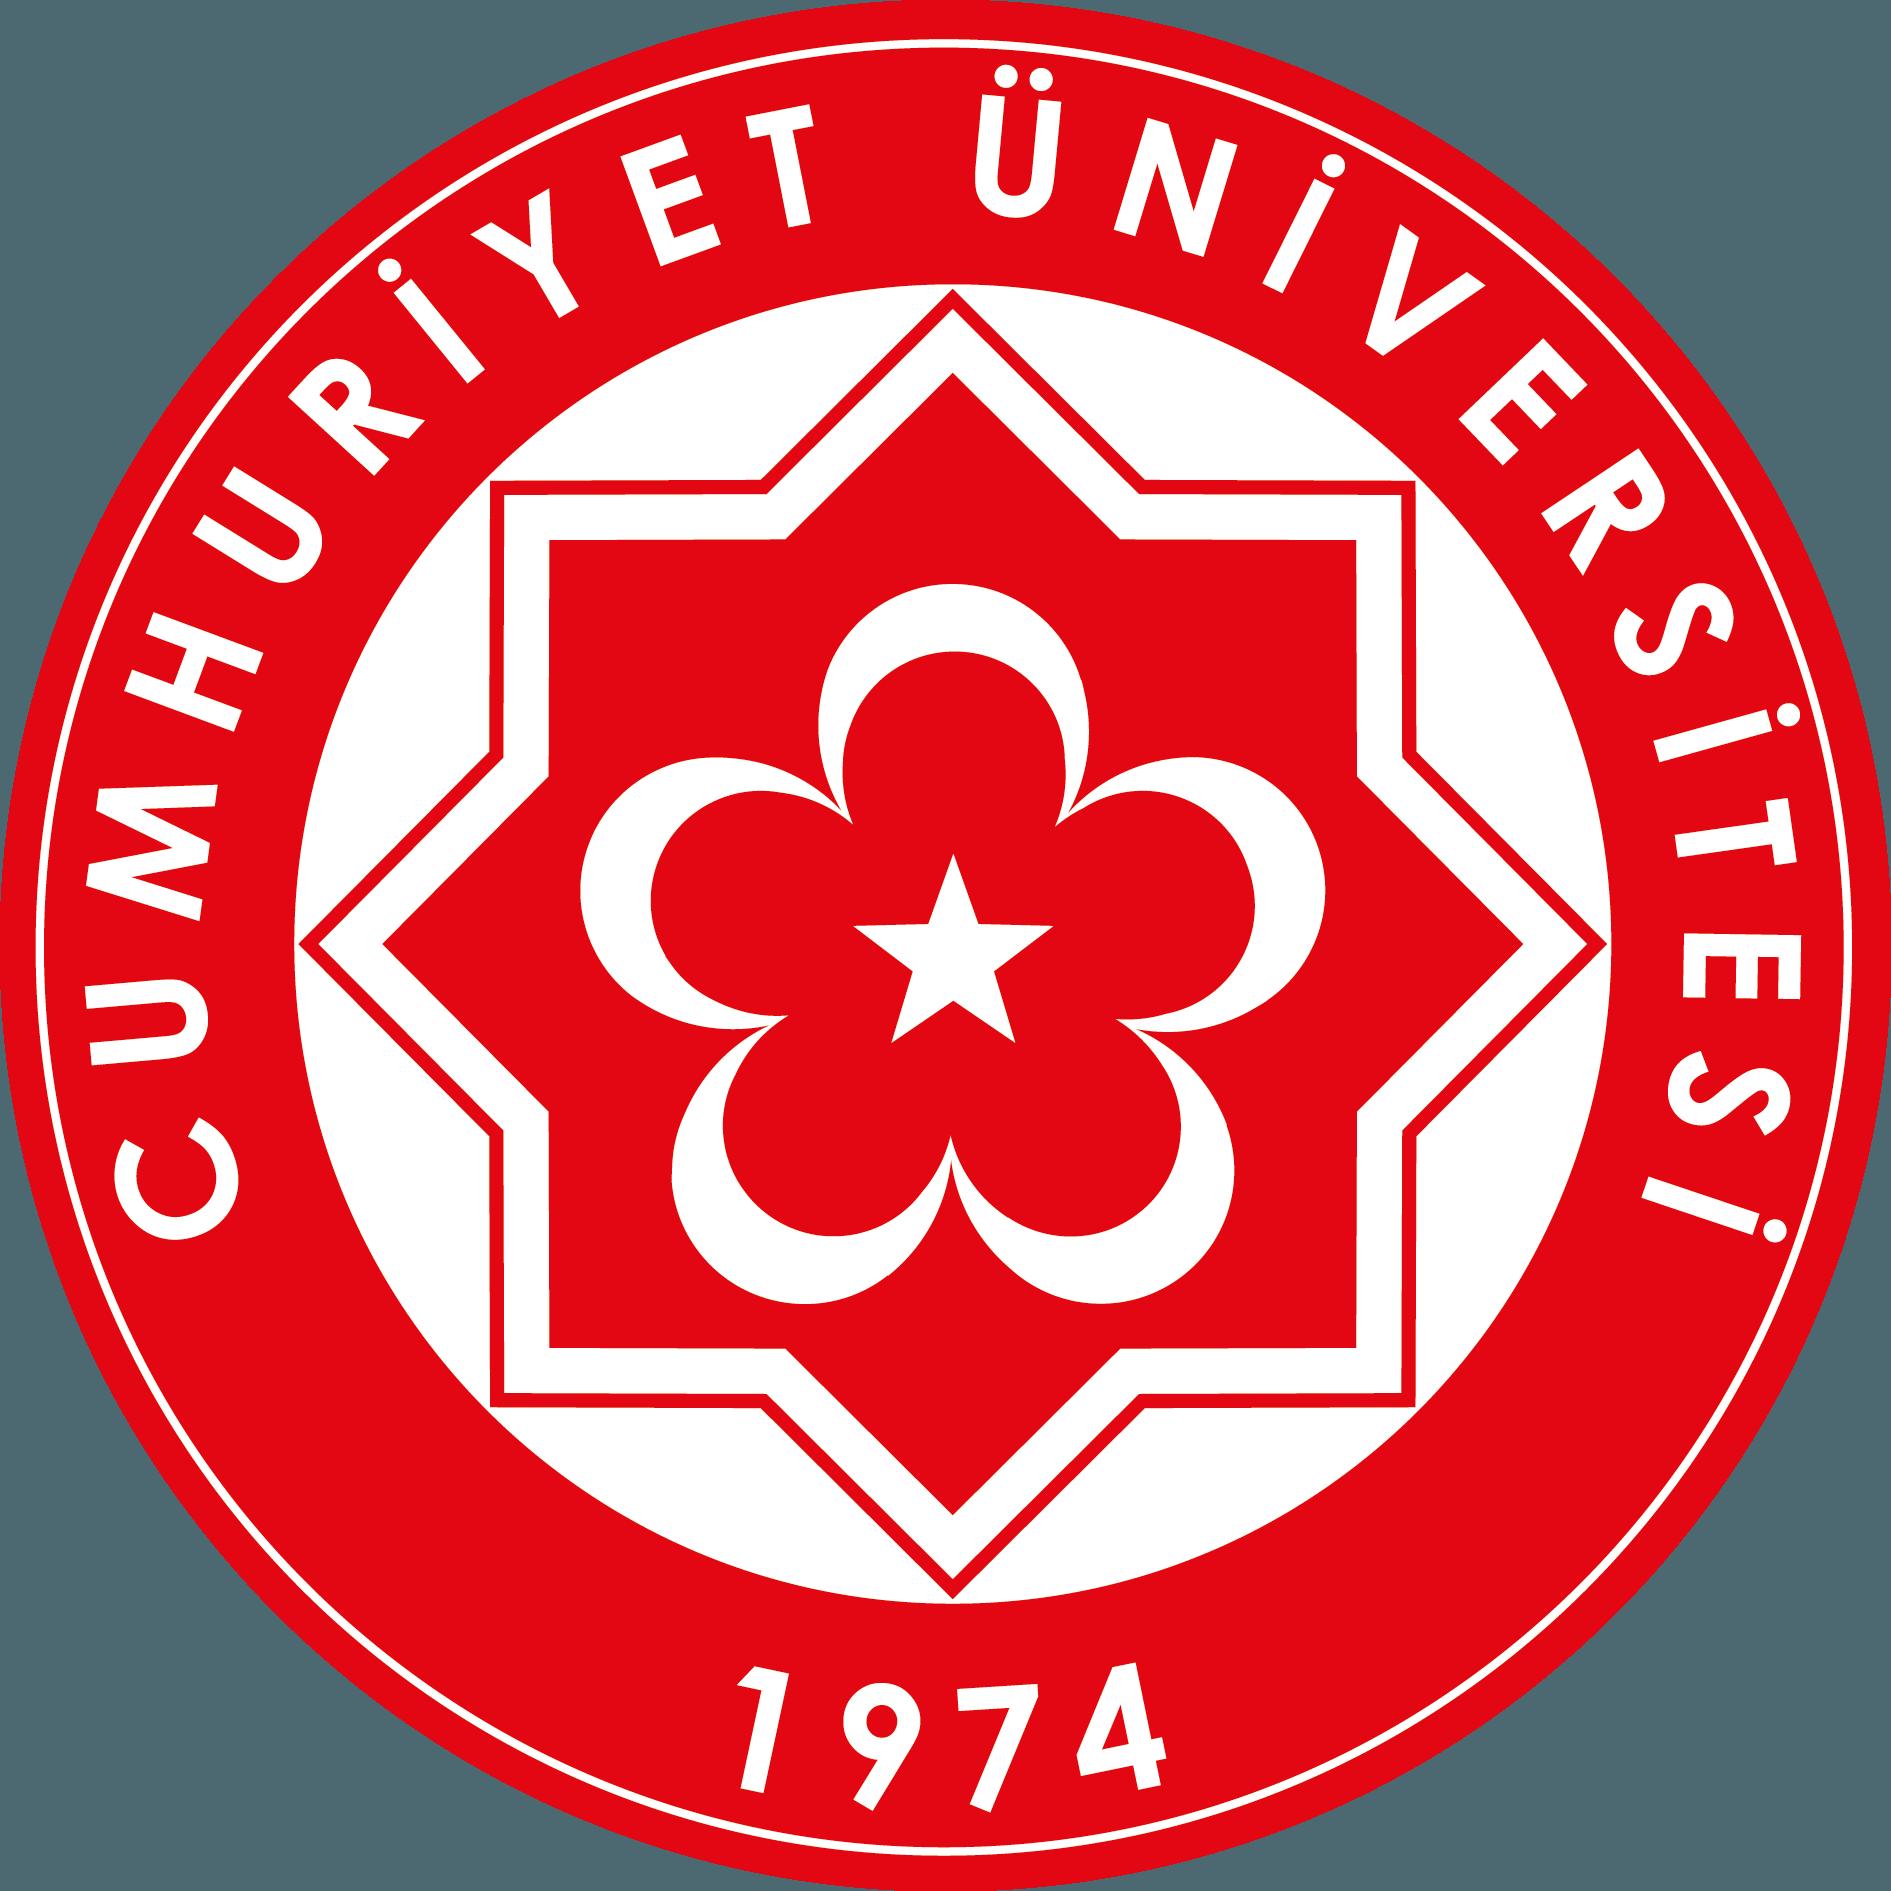 Cumhuriyet Üniversitesi Logo   Arma png